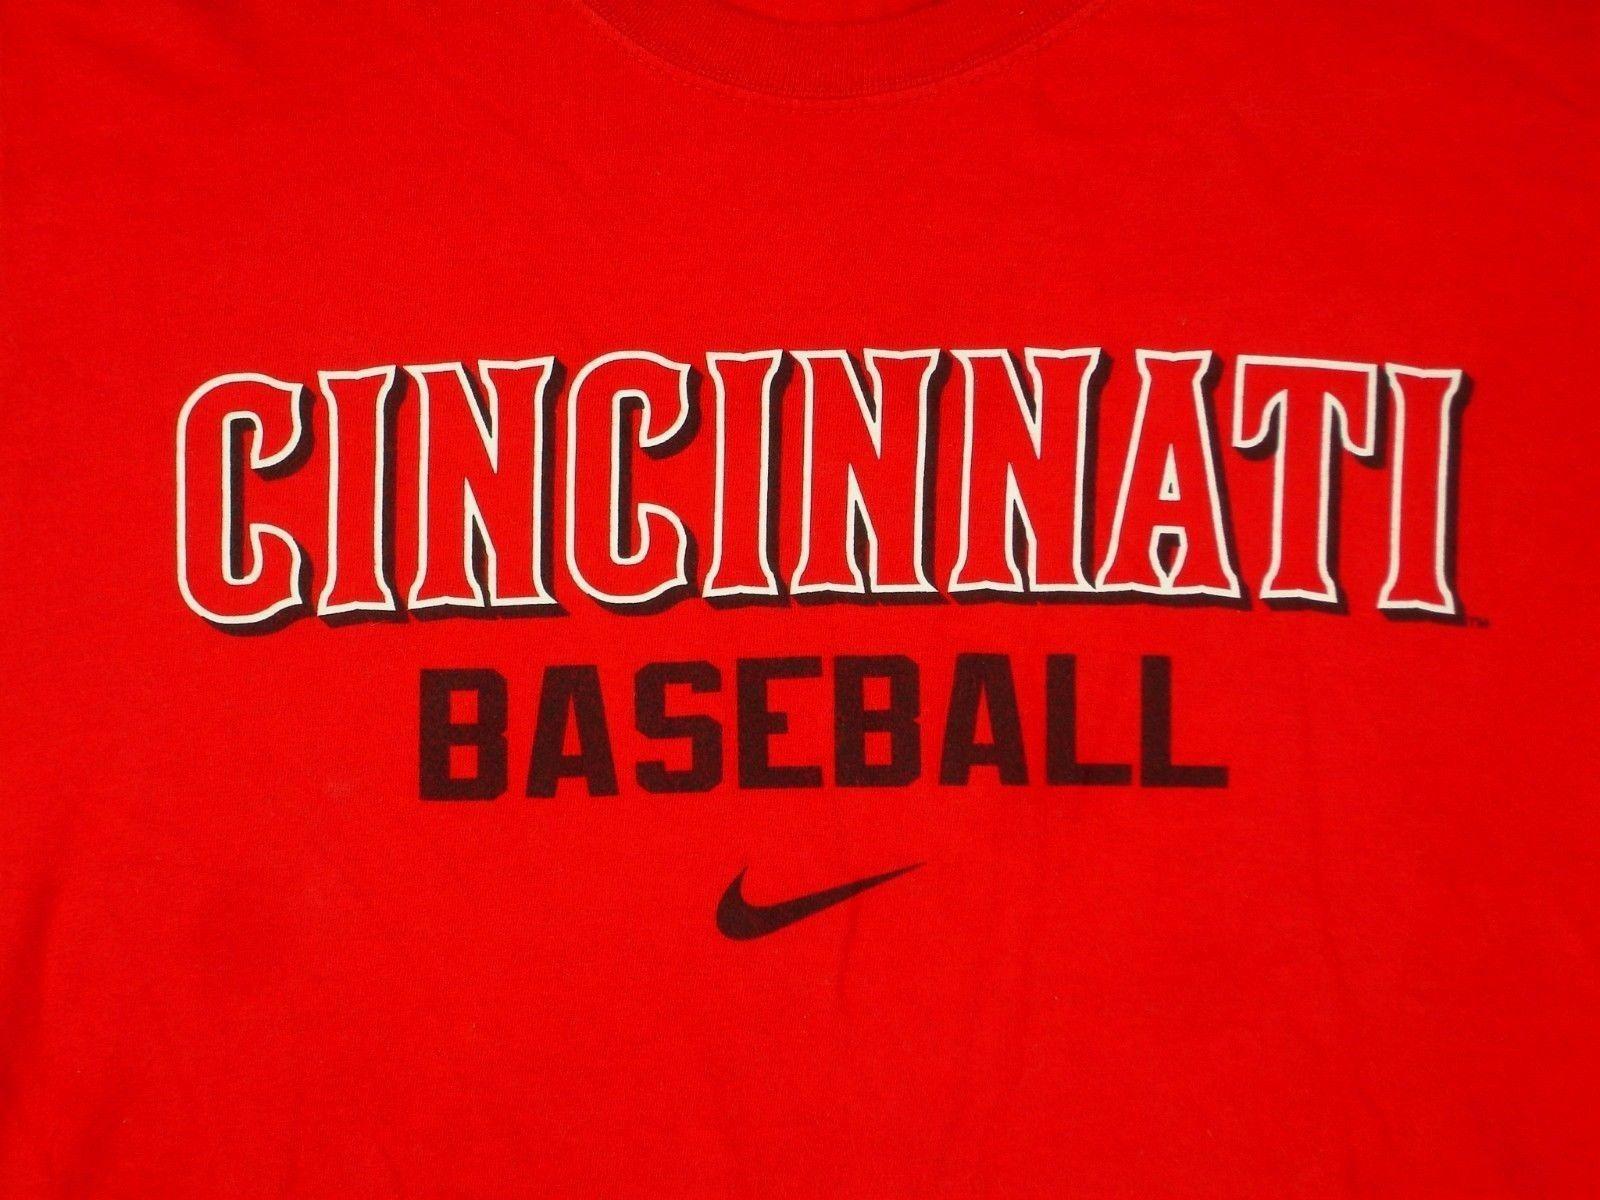 Nike Cincinnati Reds Baseball MLB Sz M Regular Fit Red T Shirt - $16.99